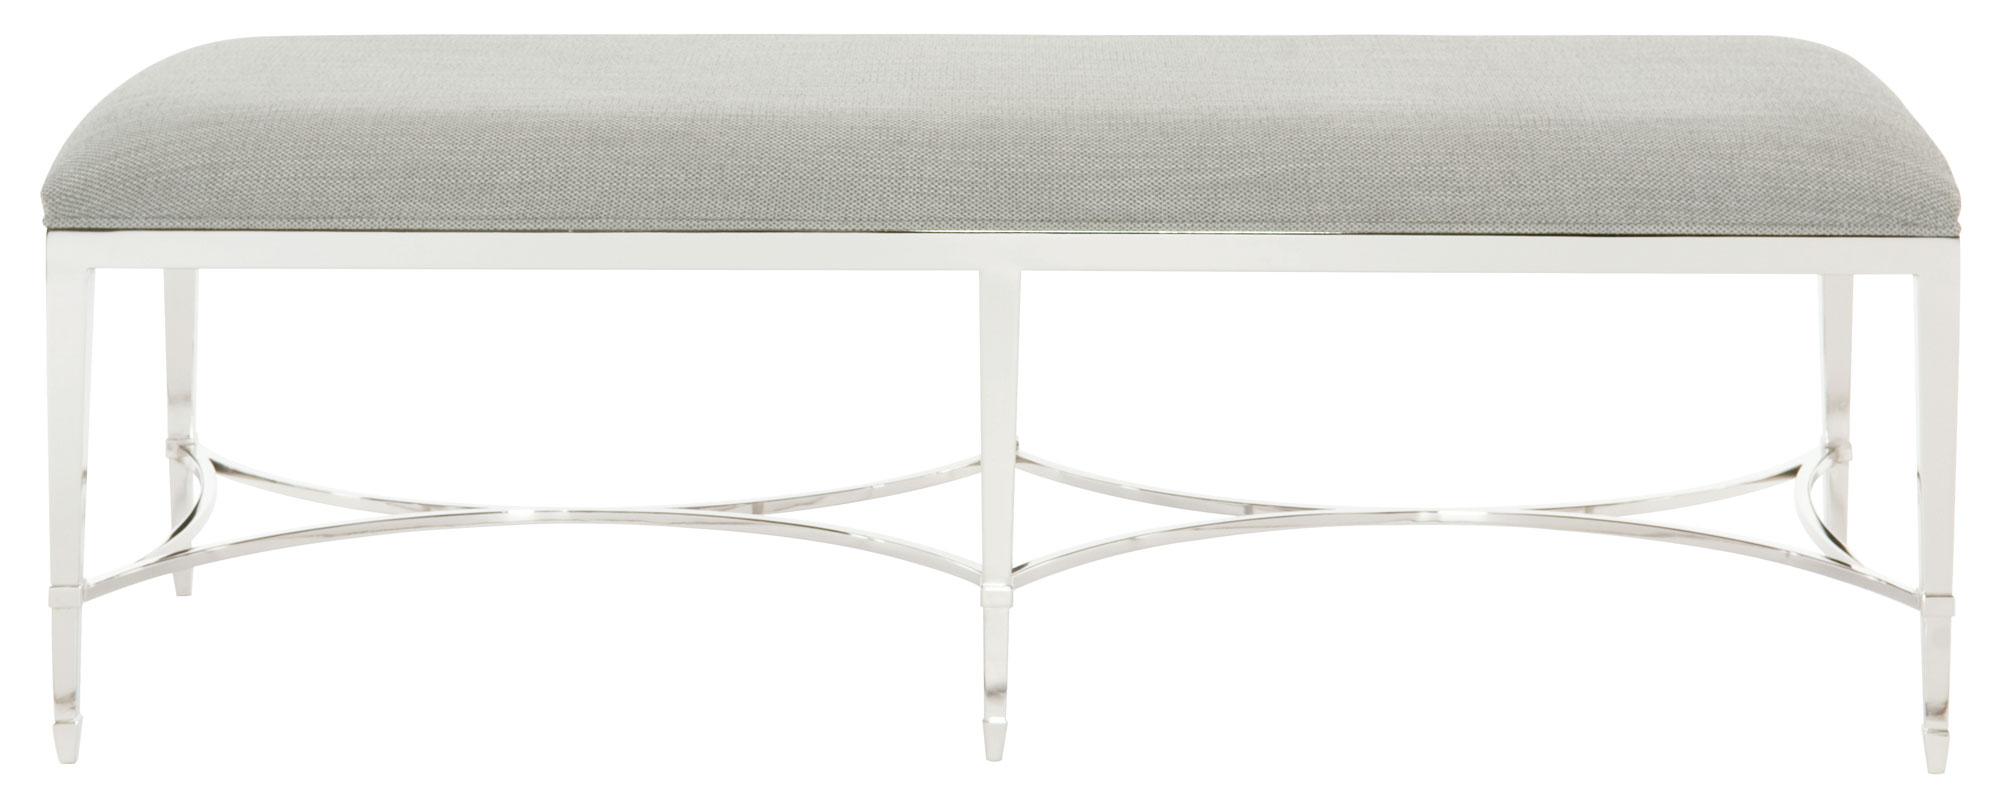 Criteria Metal Bench by Bernhardt at Baer's Furniture